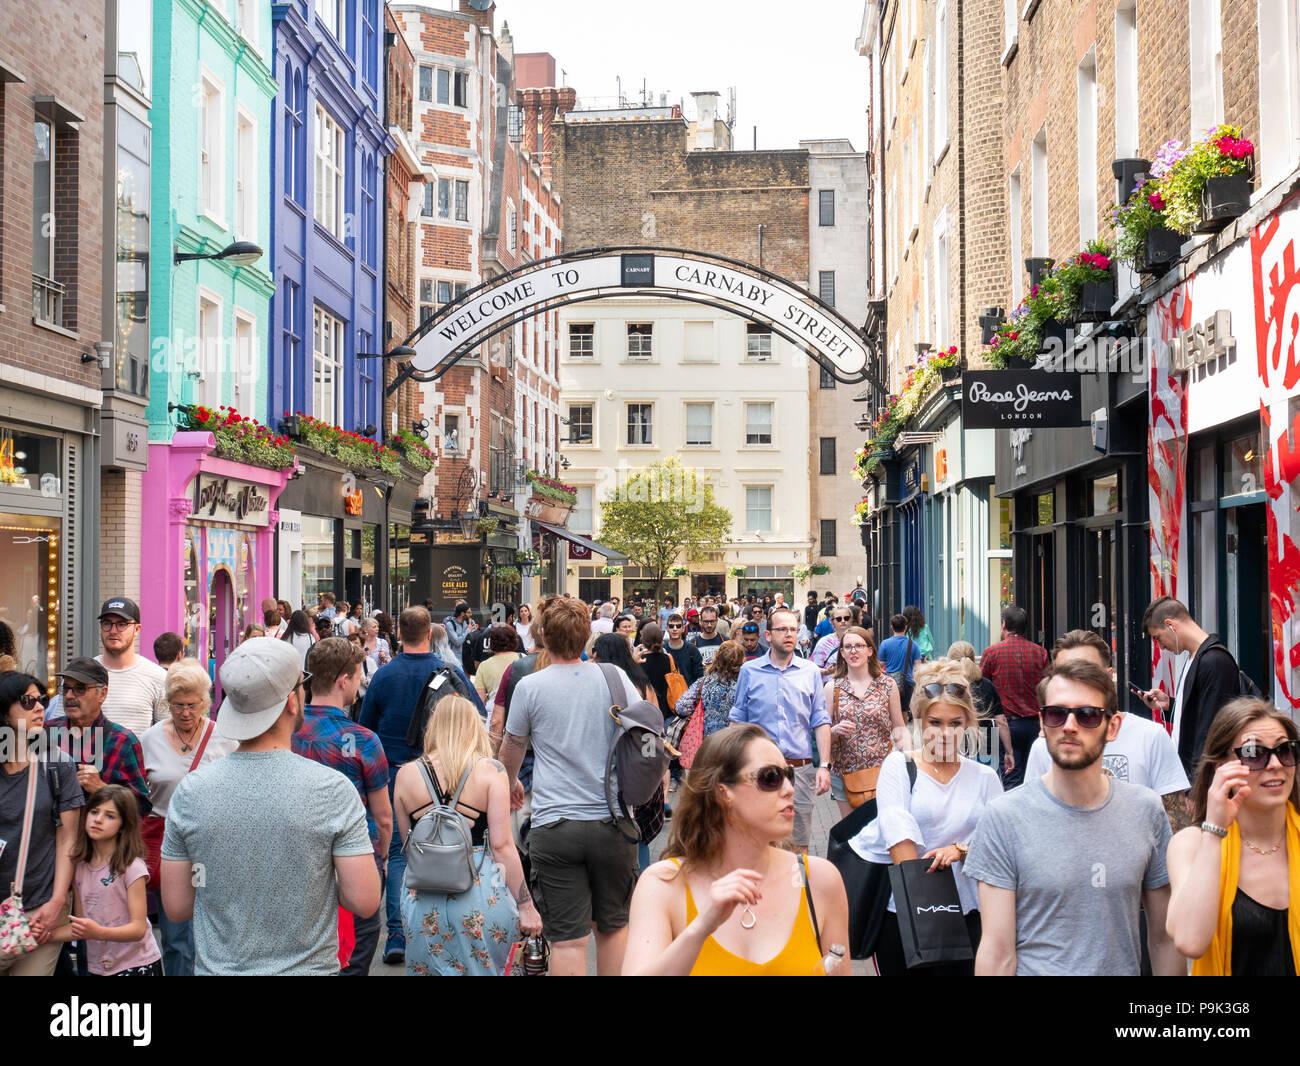 Carnaby Street, Londres, Reino Unido. Imagen De Stock